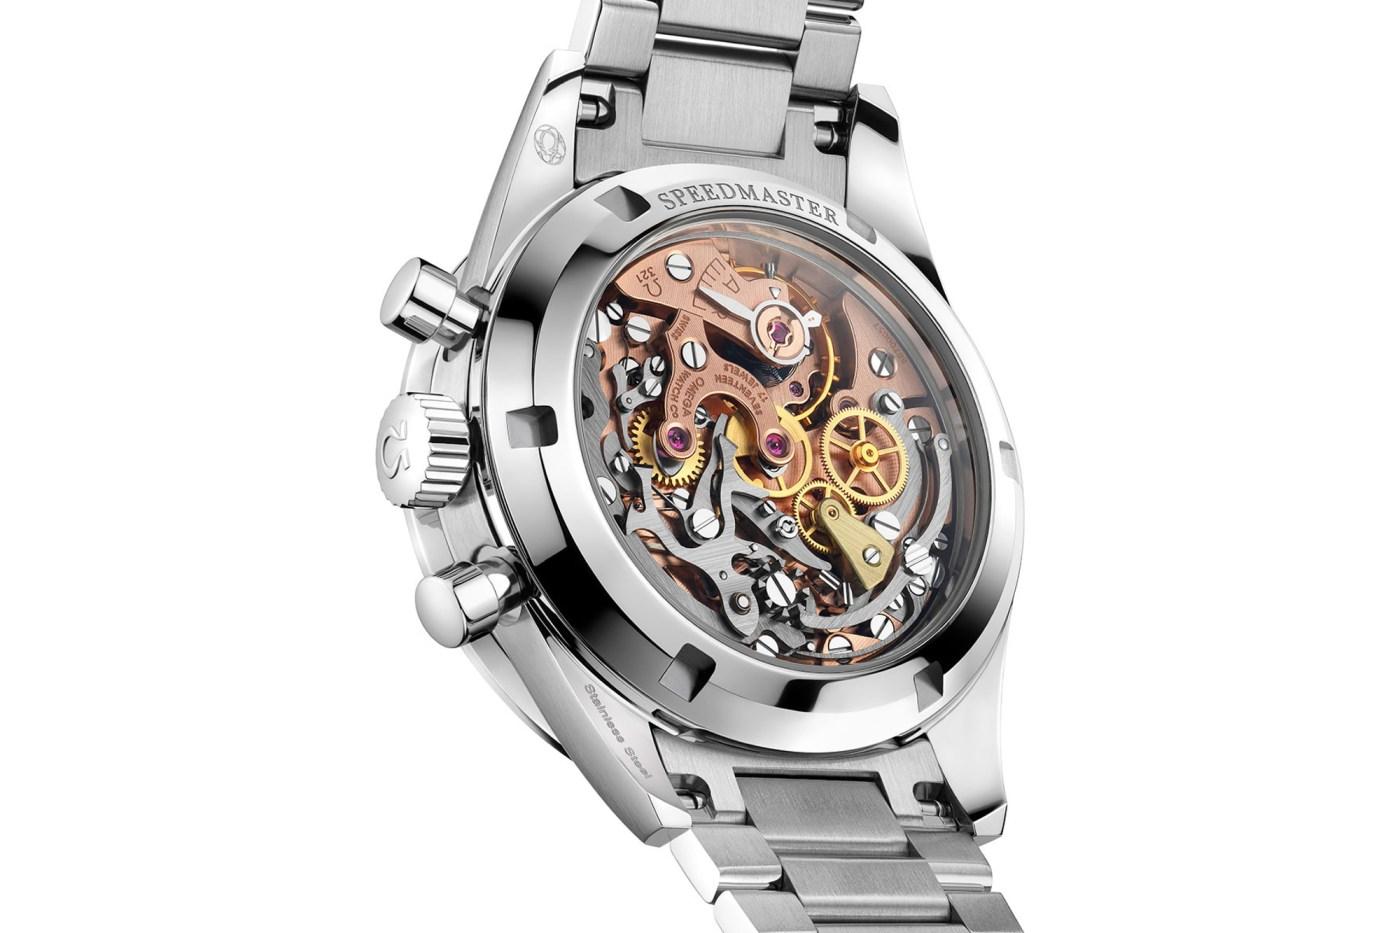 Speedmaster Moonwatch 321 Ed White 2020 caseback